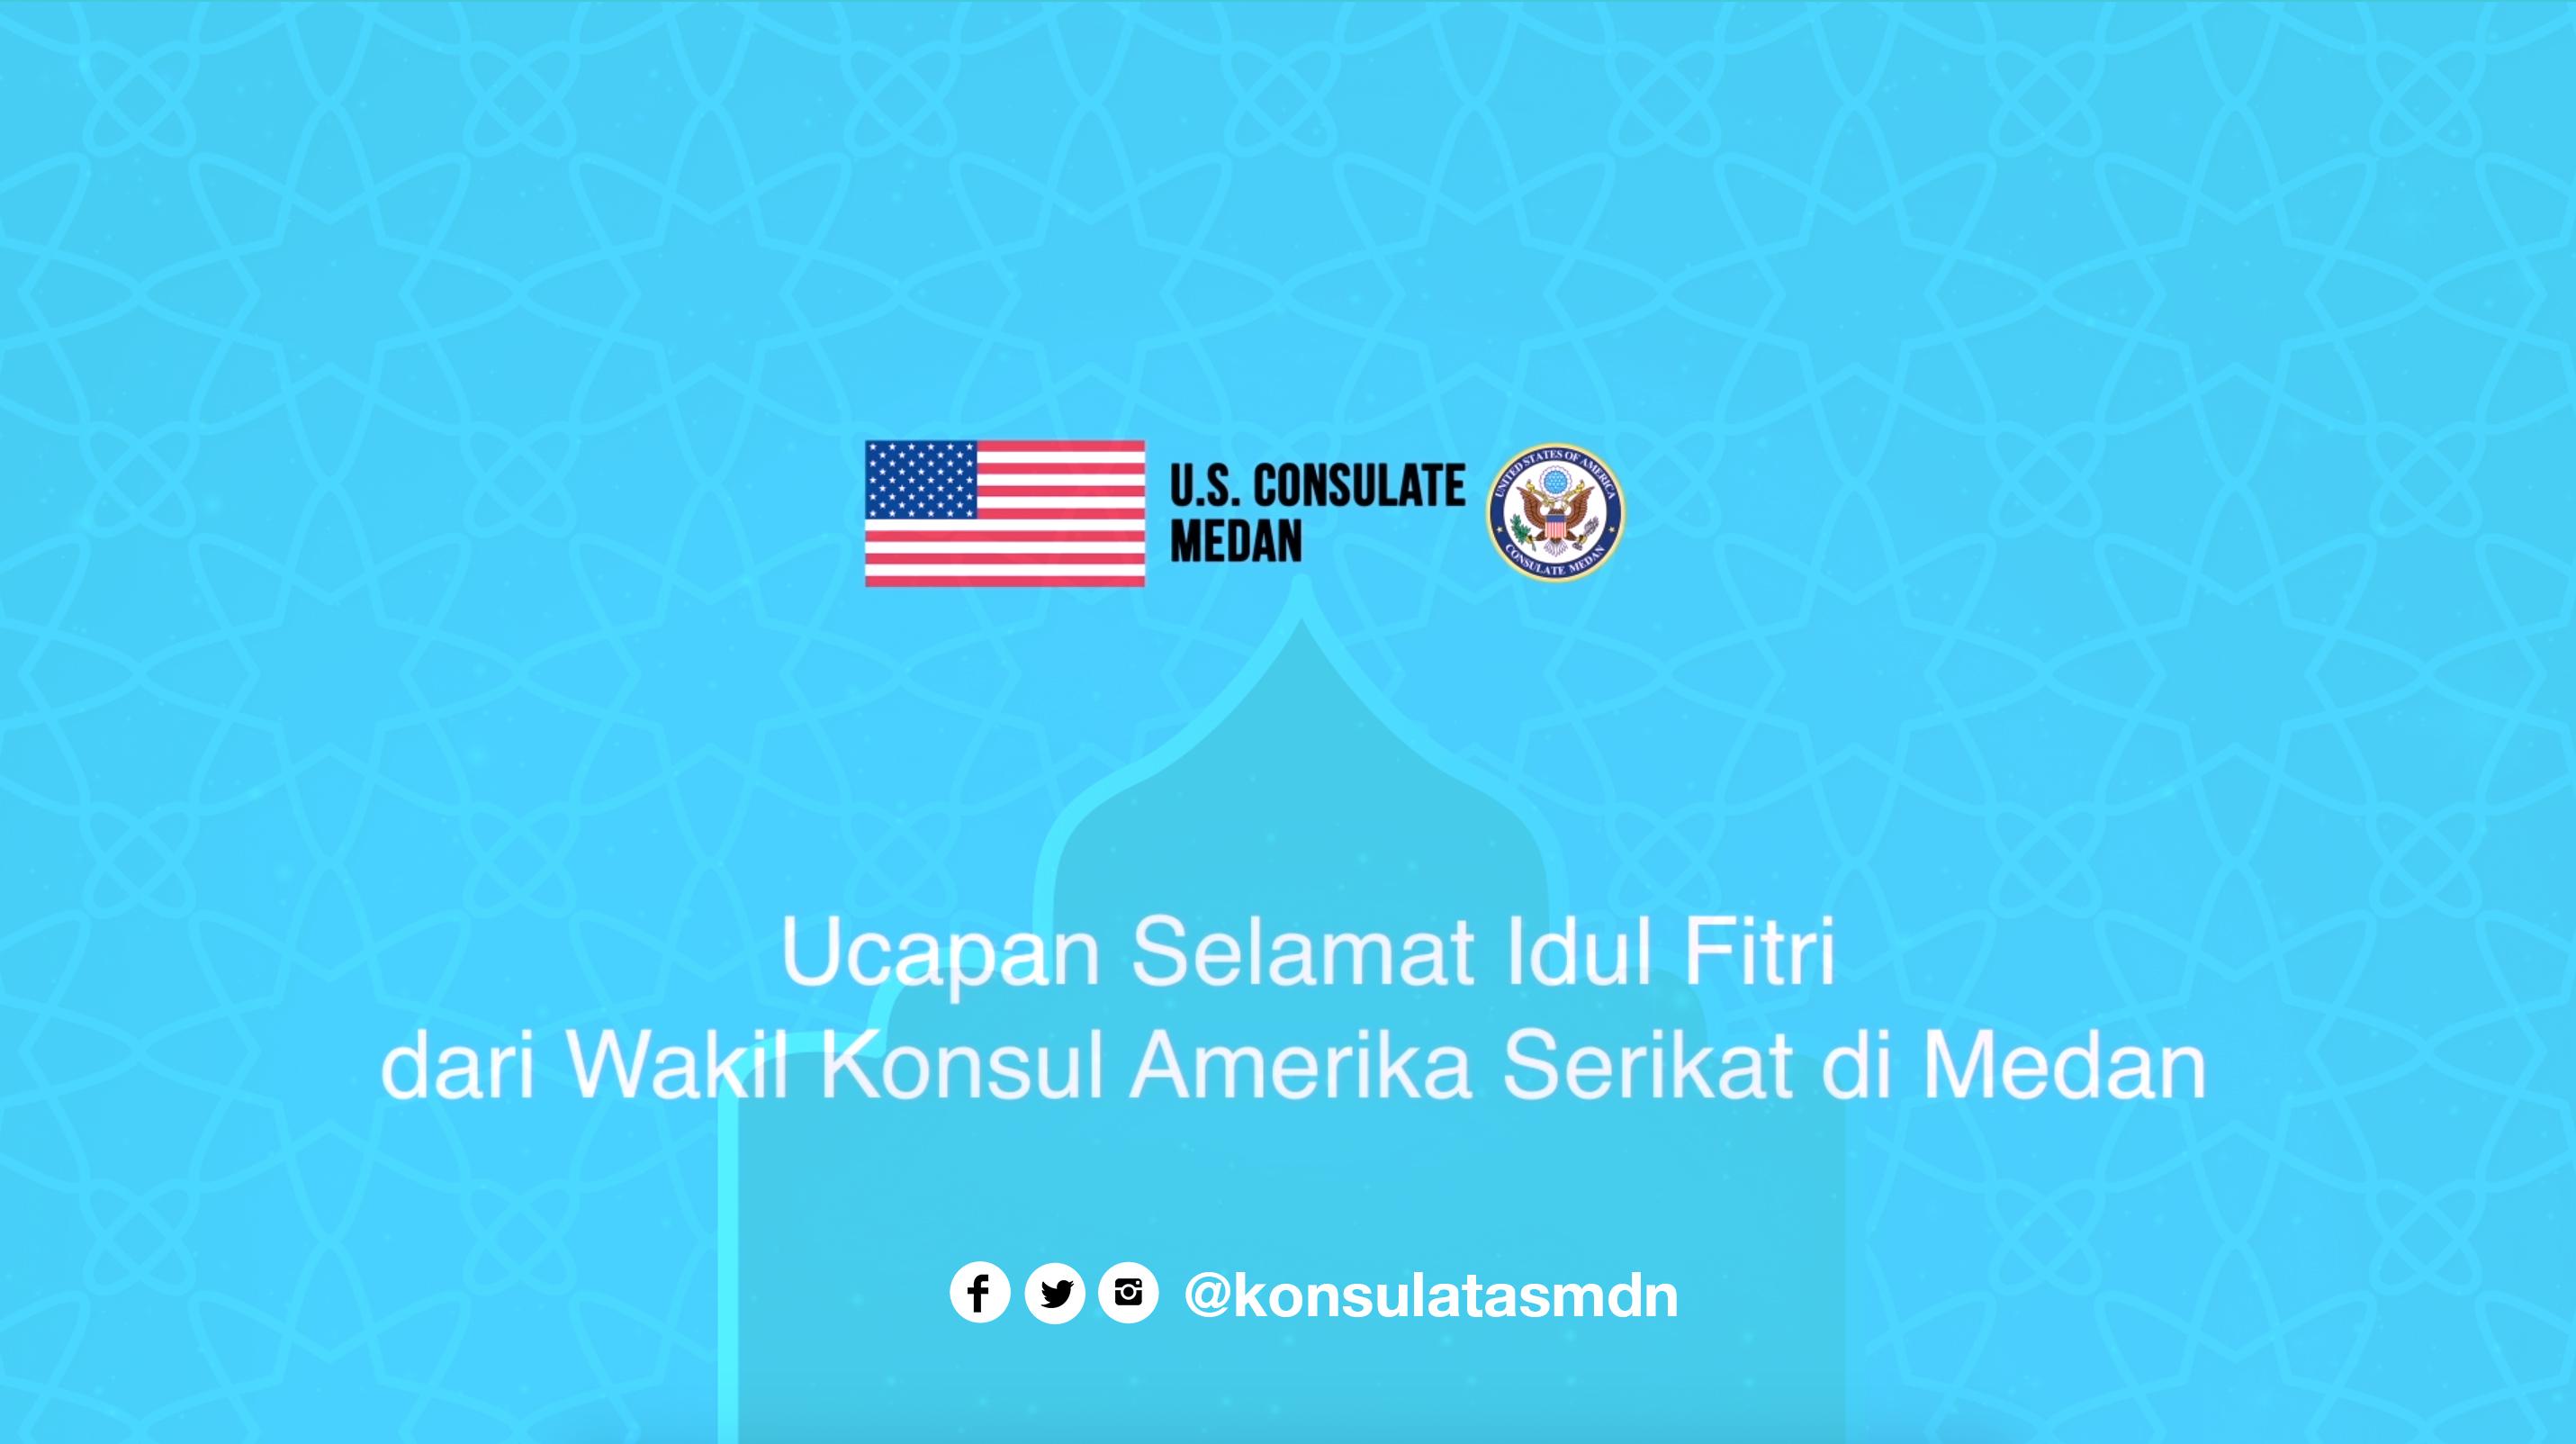 Idul Fitri Greetings By Deputy Consul U S Consulate Medan U S